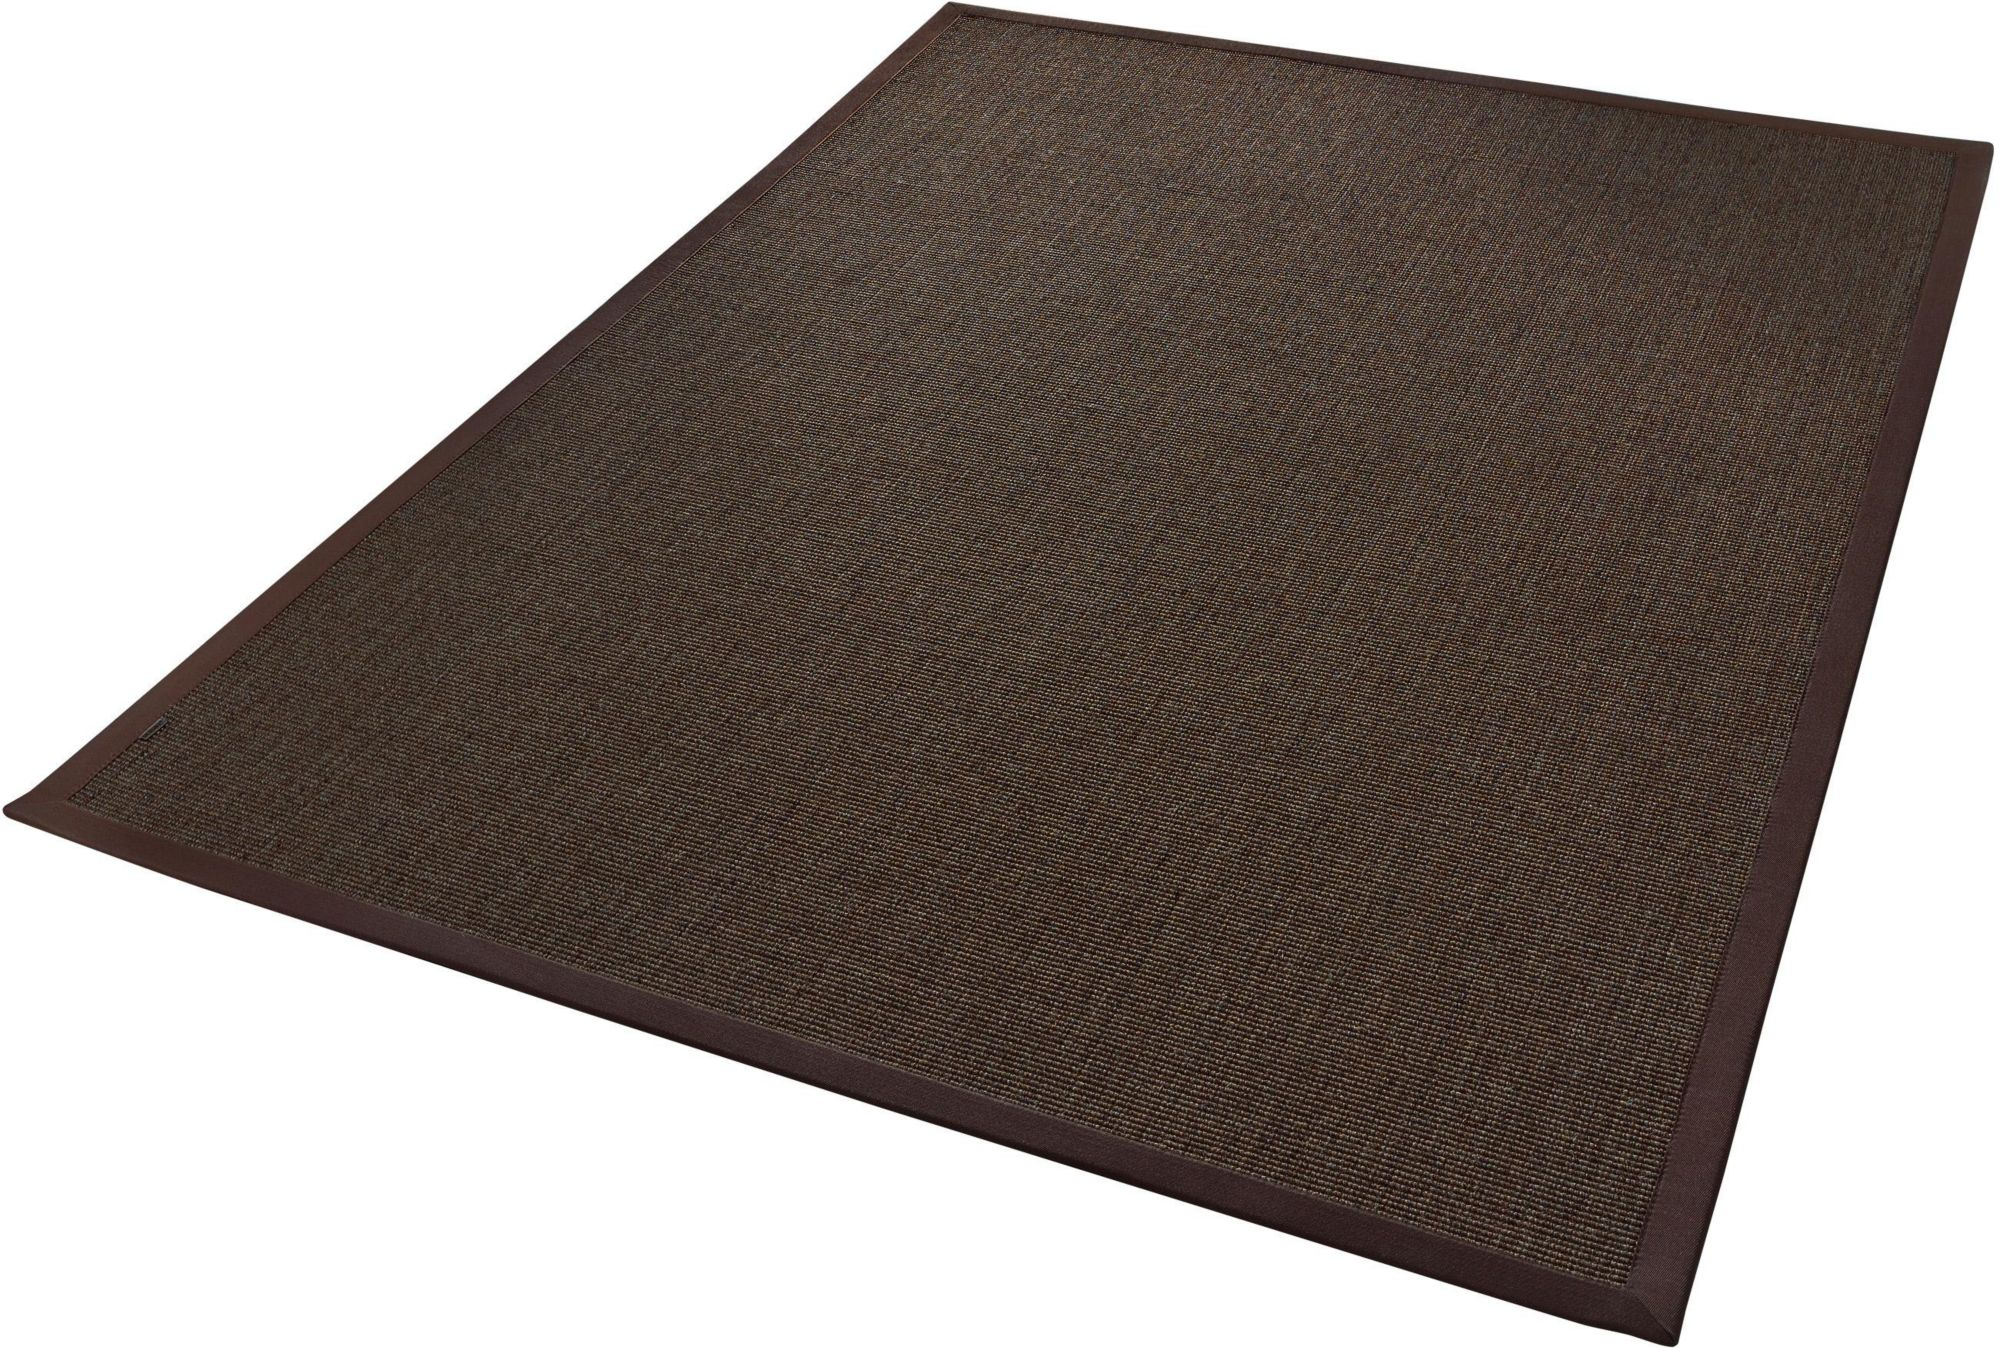 DEKOWE Sisal-Teppich, Dekowe, »Mara S2«, Höhe 5 mm, gewebt, Wunschmaß